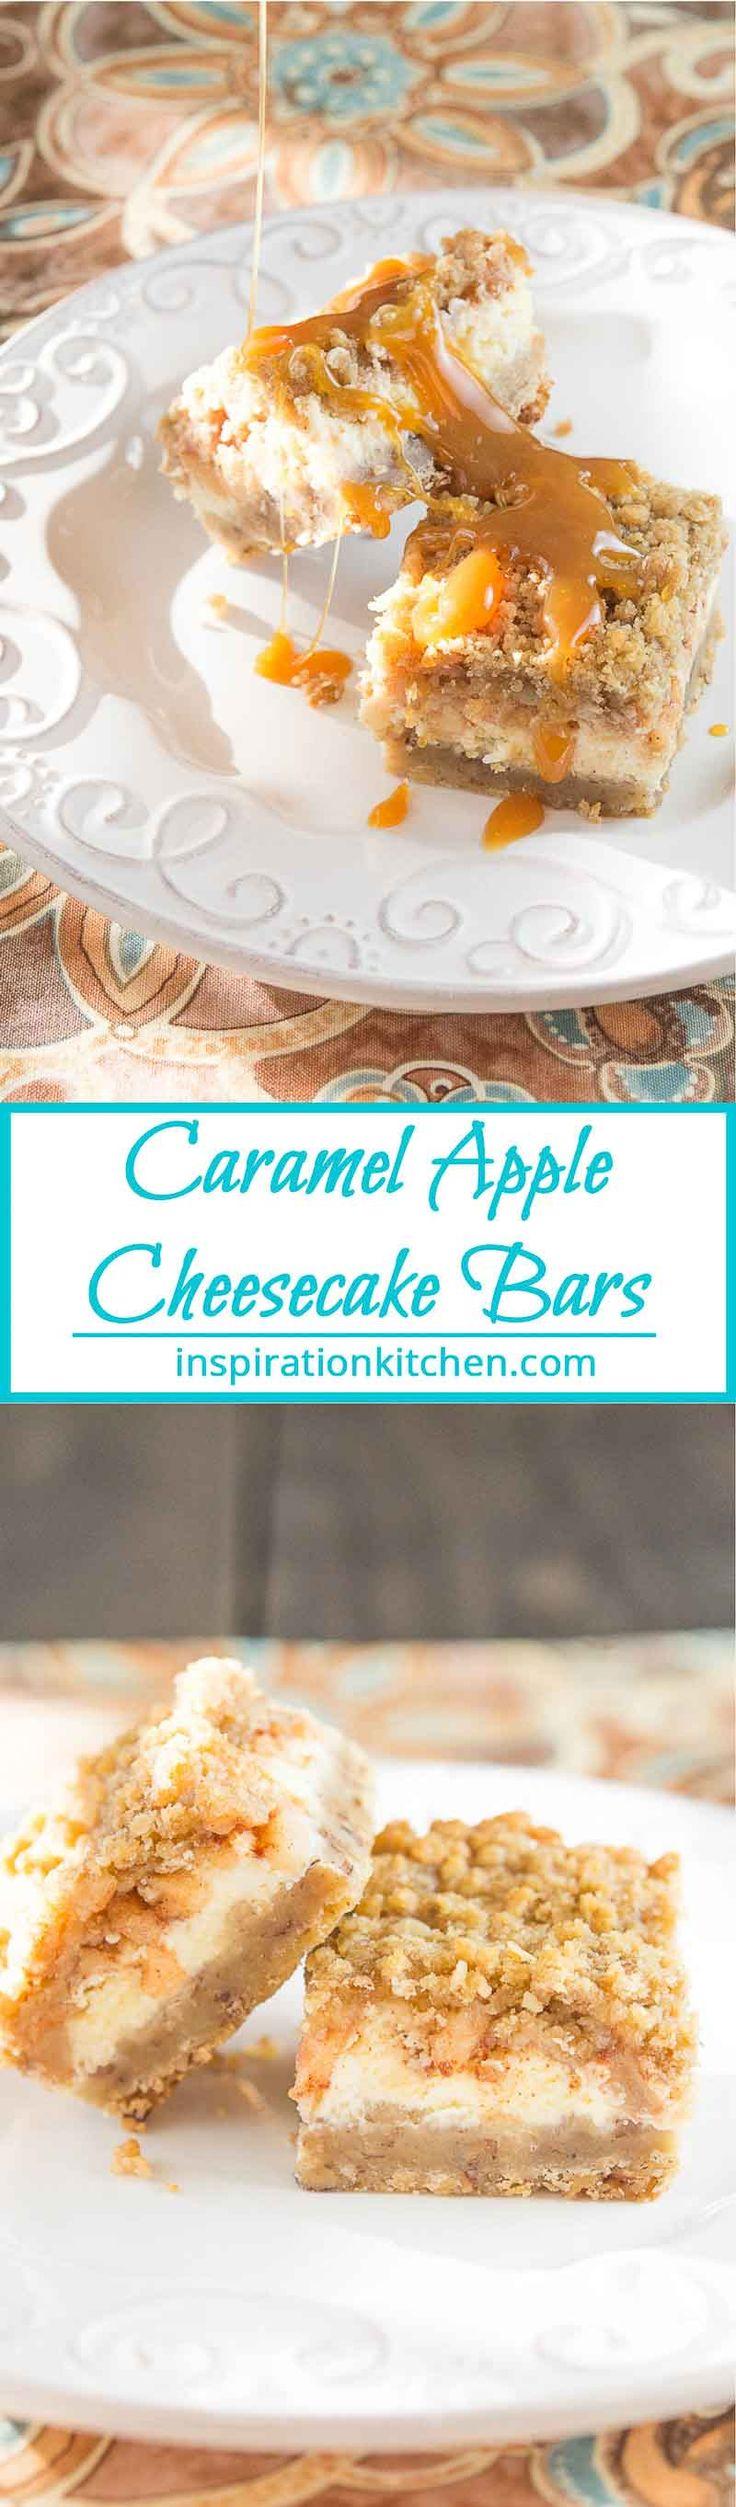 Caramel Apple Cheesecake Bars   Inspiration Kitchen